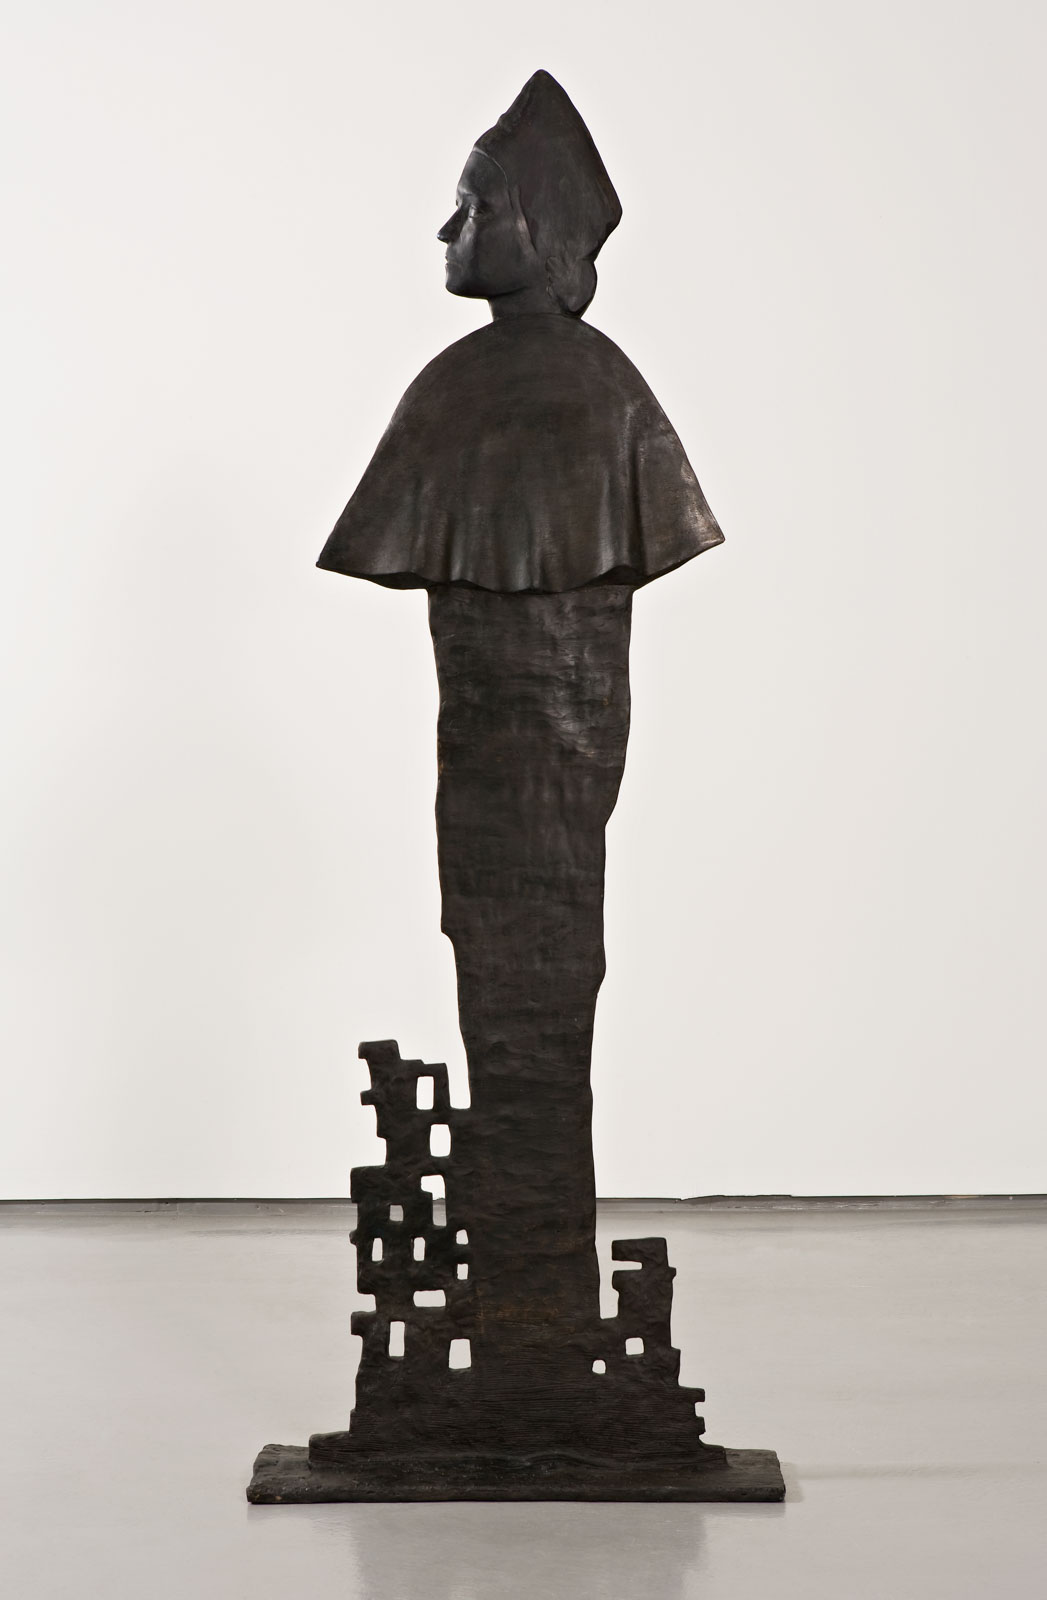 Lyra, 2007, Patinated bronze, 201.5 x 74.5 x 25 cm, ed. 3 + AP